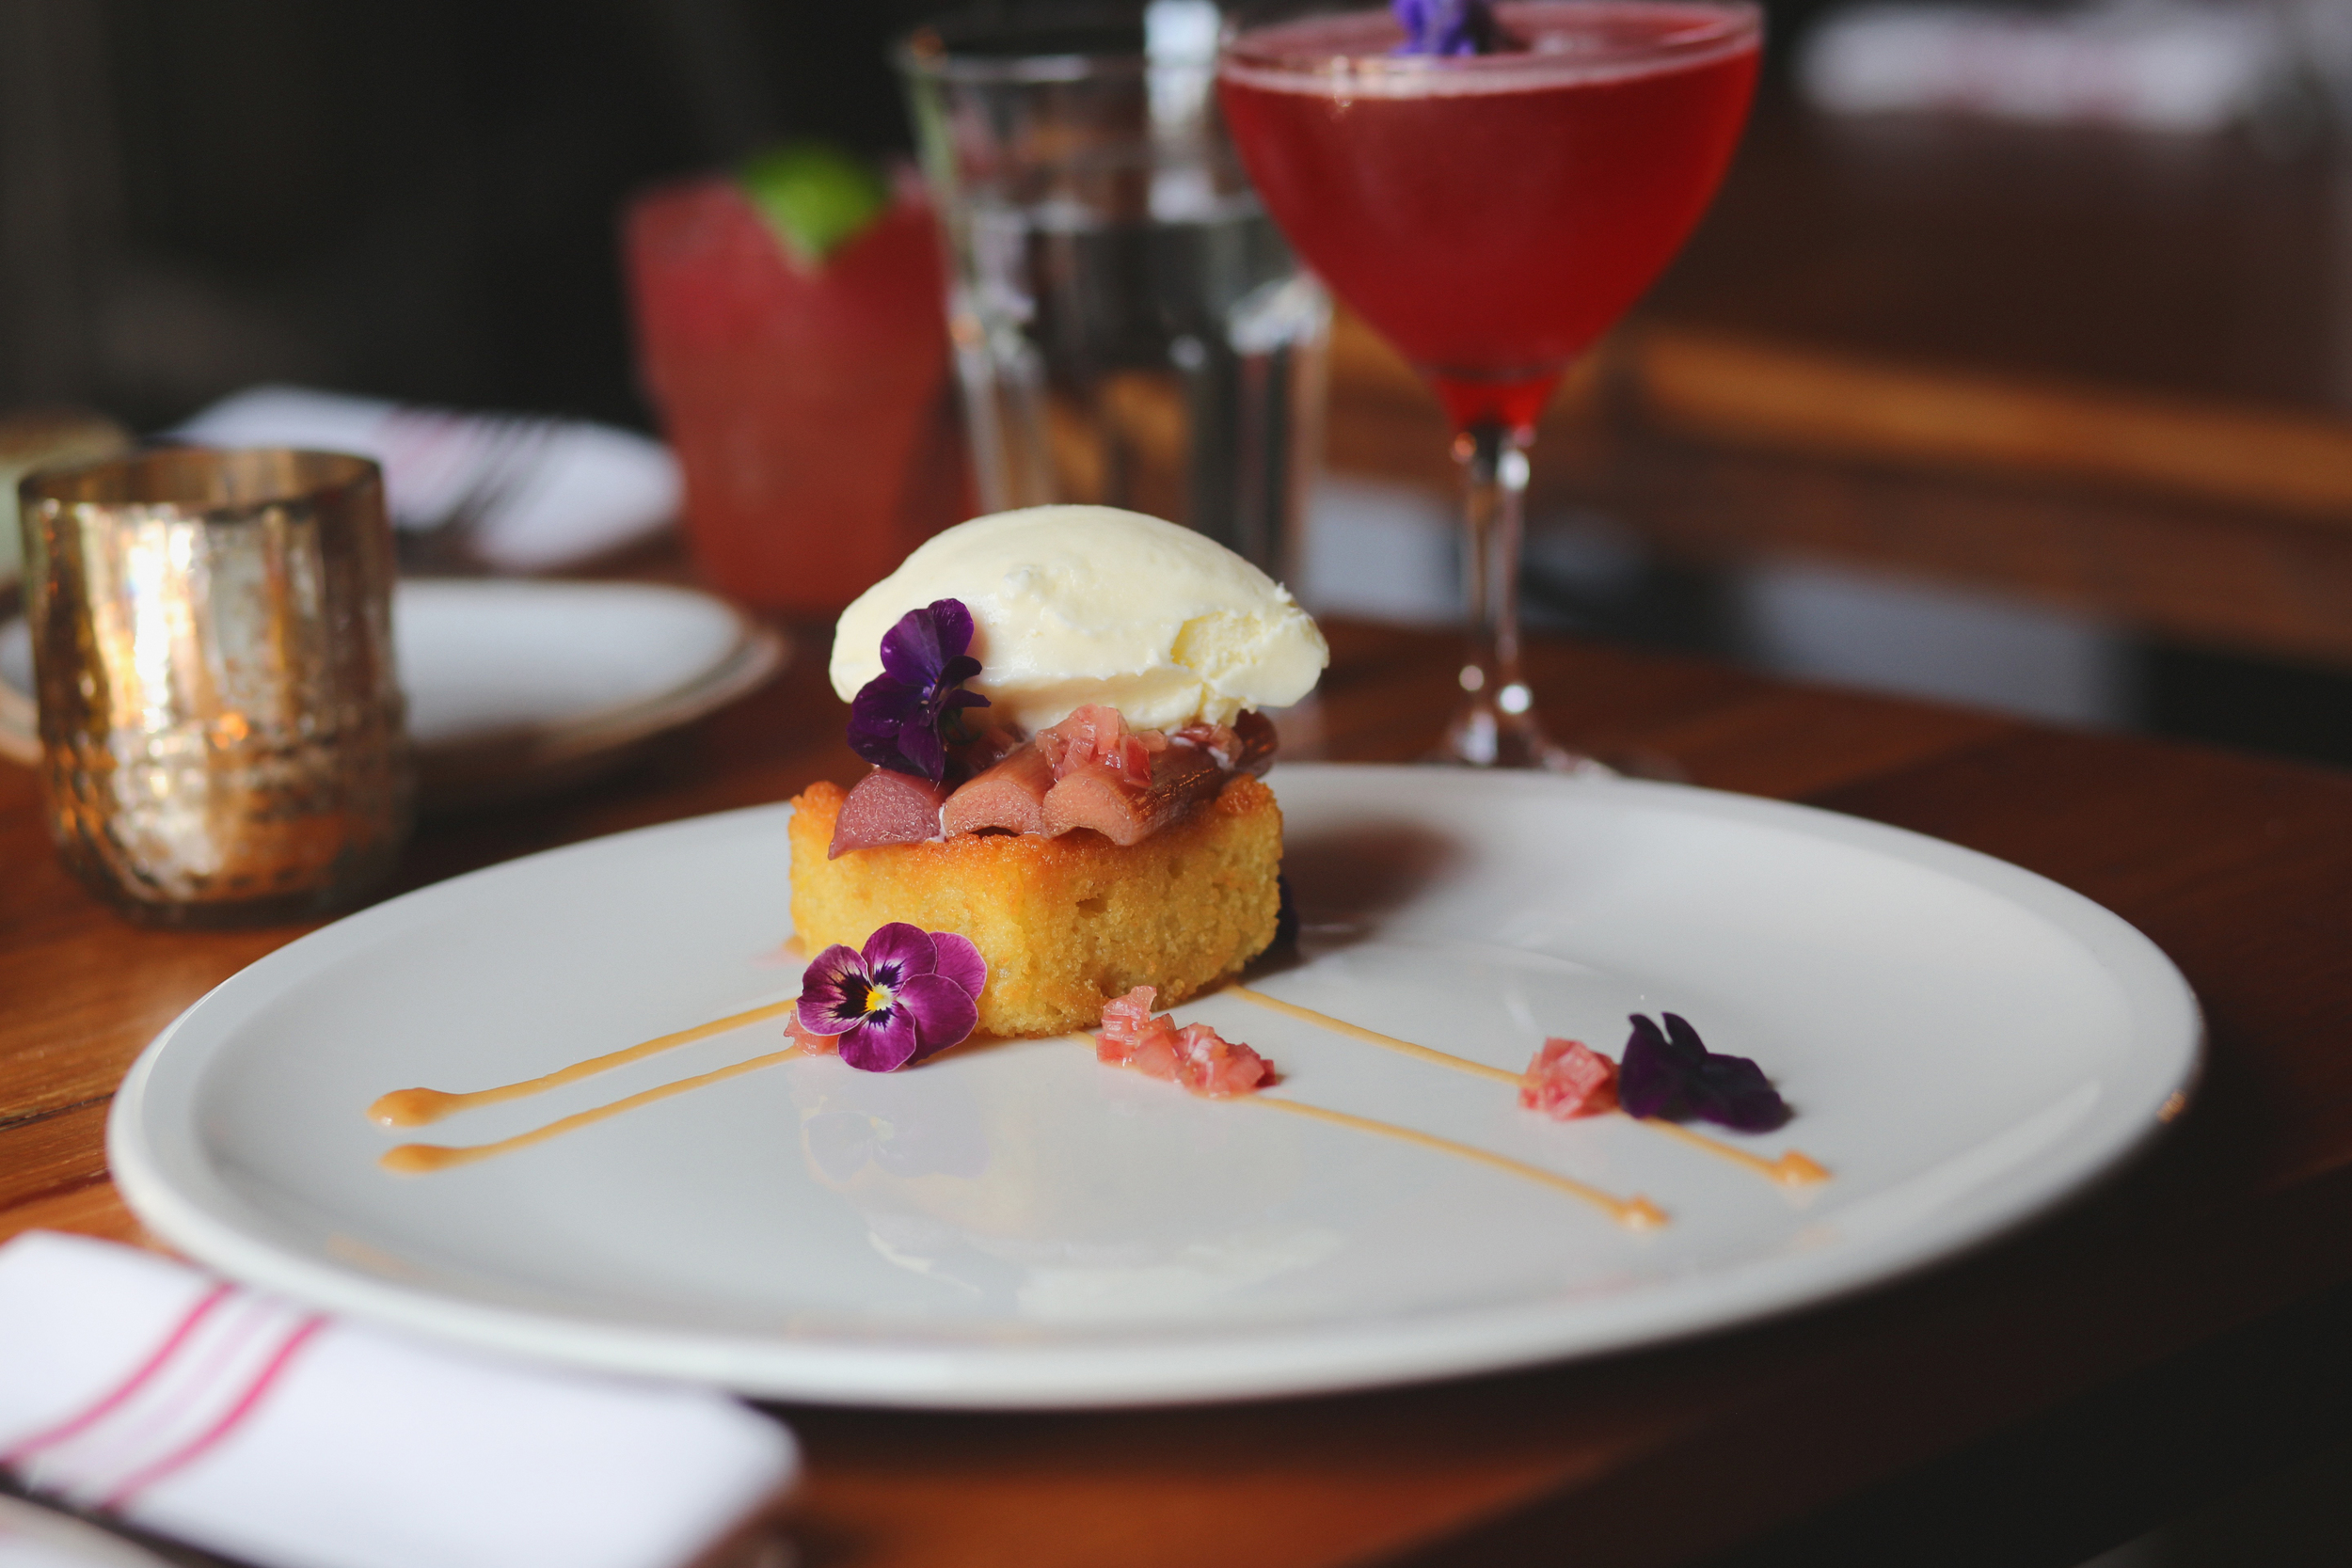 la torta: orange blossom almond cake, vanilla poached rhubarb, goat milk gelato